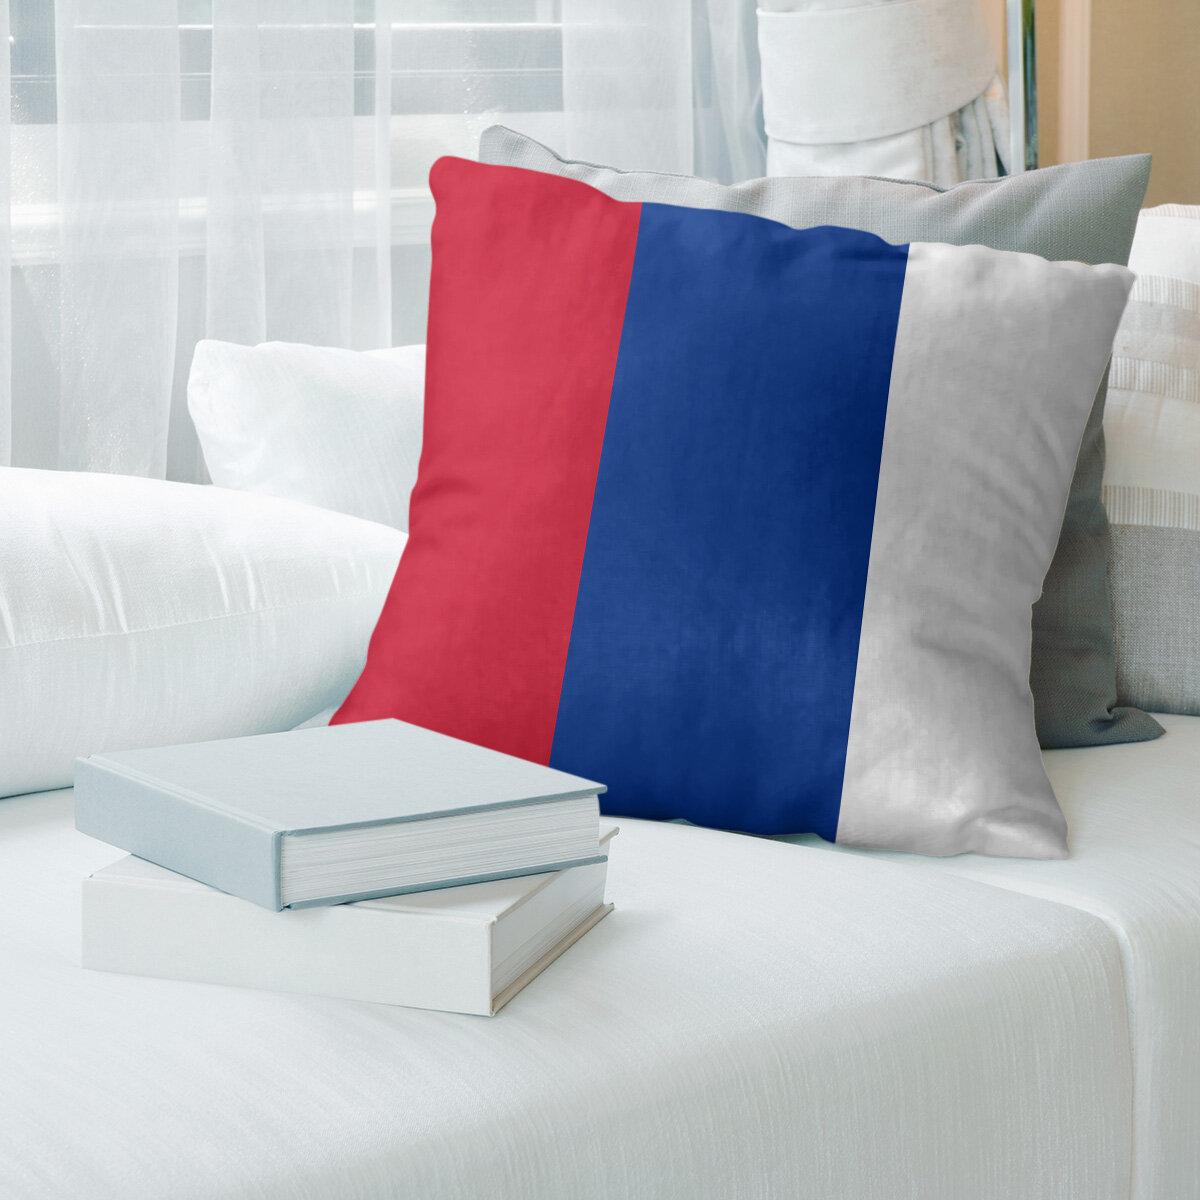 East Urban Home New England Throwback Football Euro Pillow Cover Wayfair